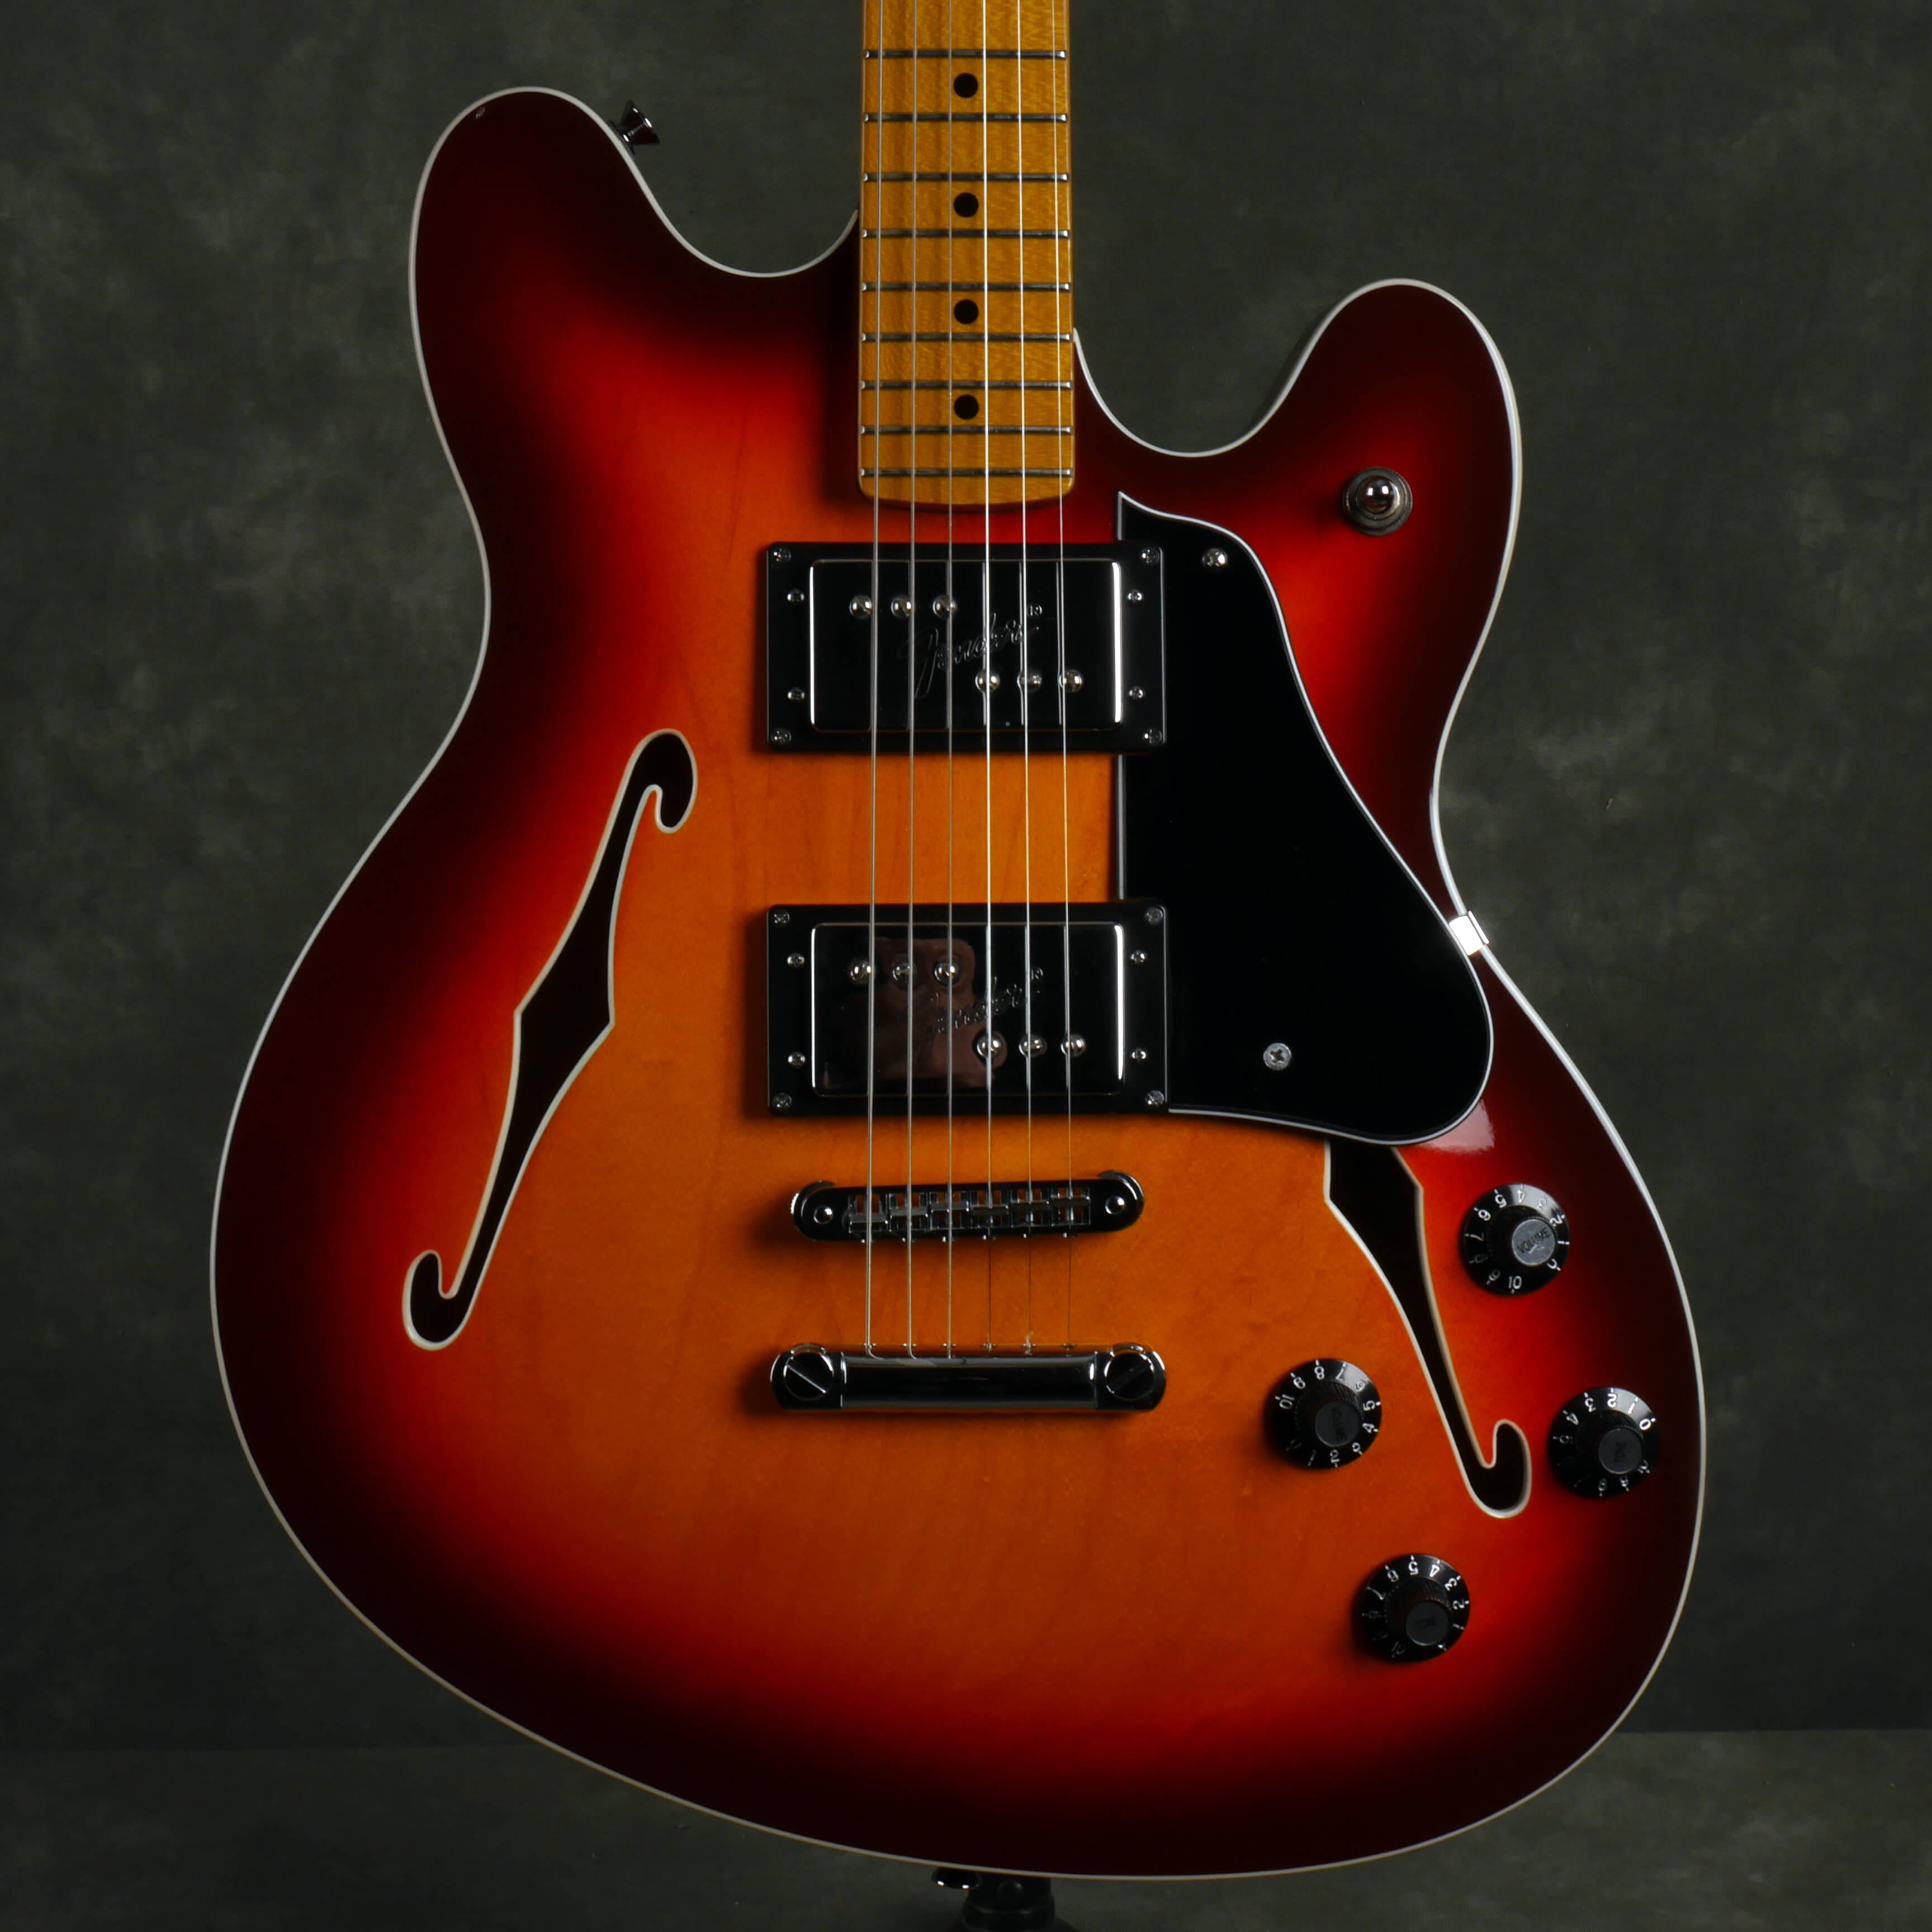 Fender Starcaster Electric Guitar - Sunburst - 2nd Hand